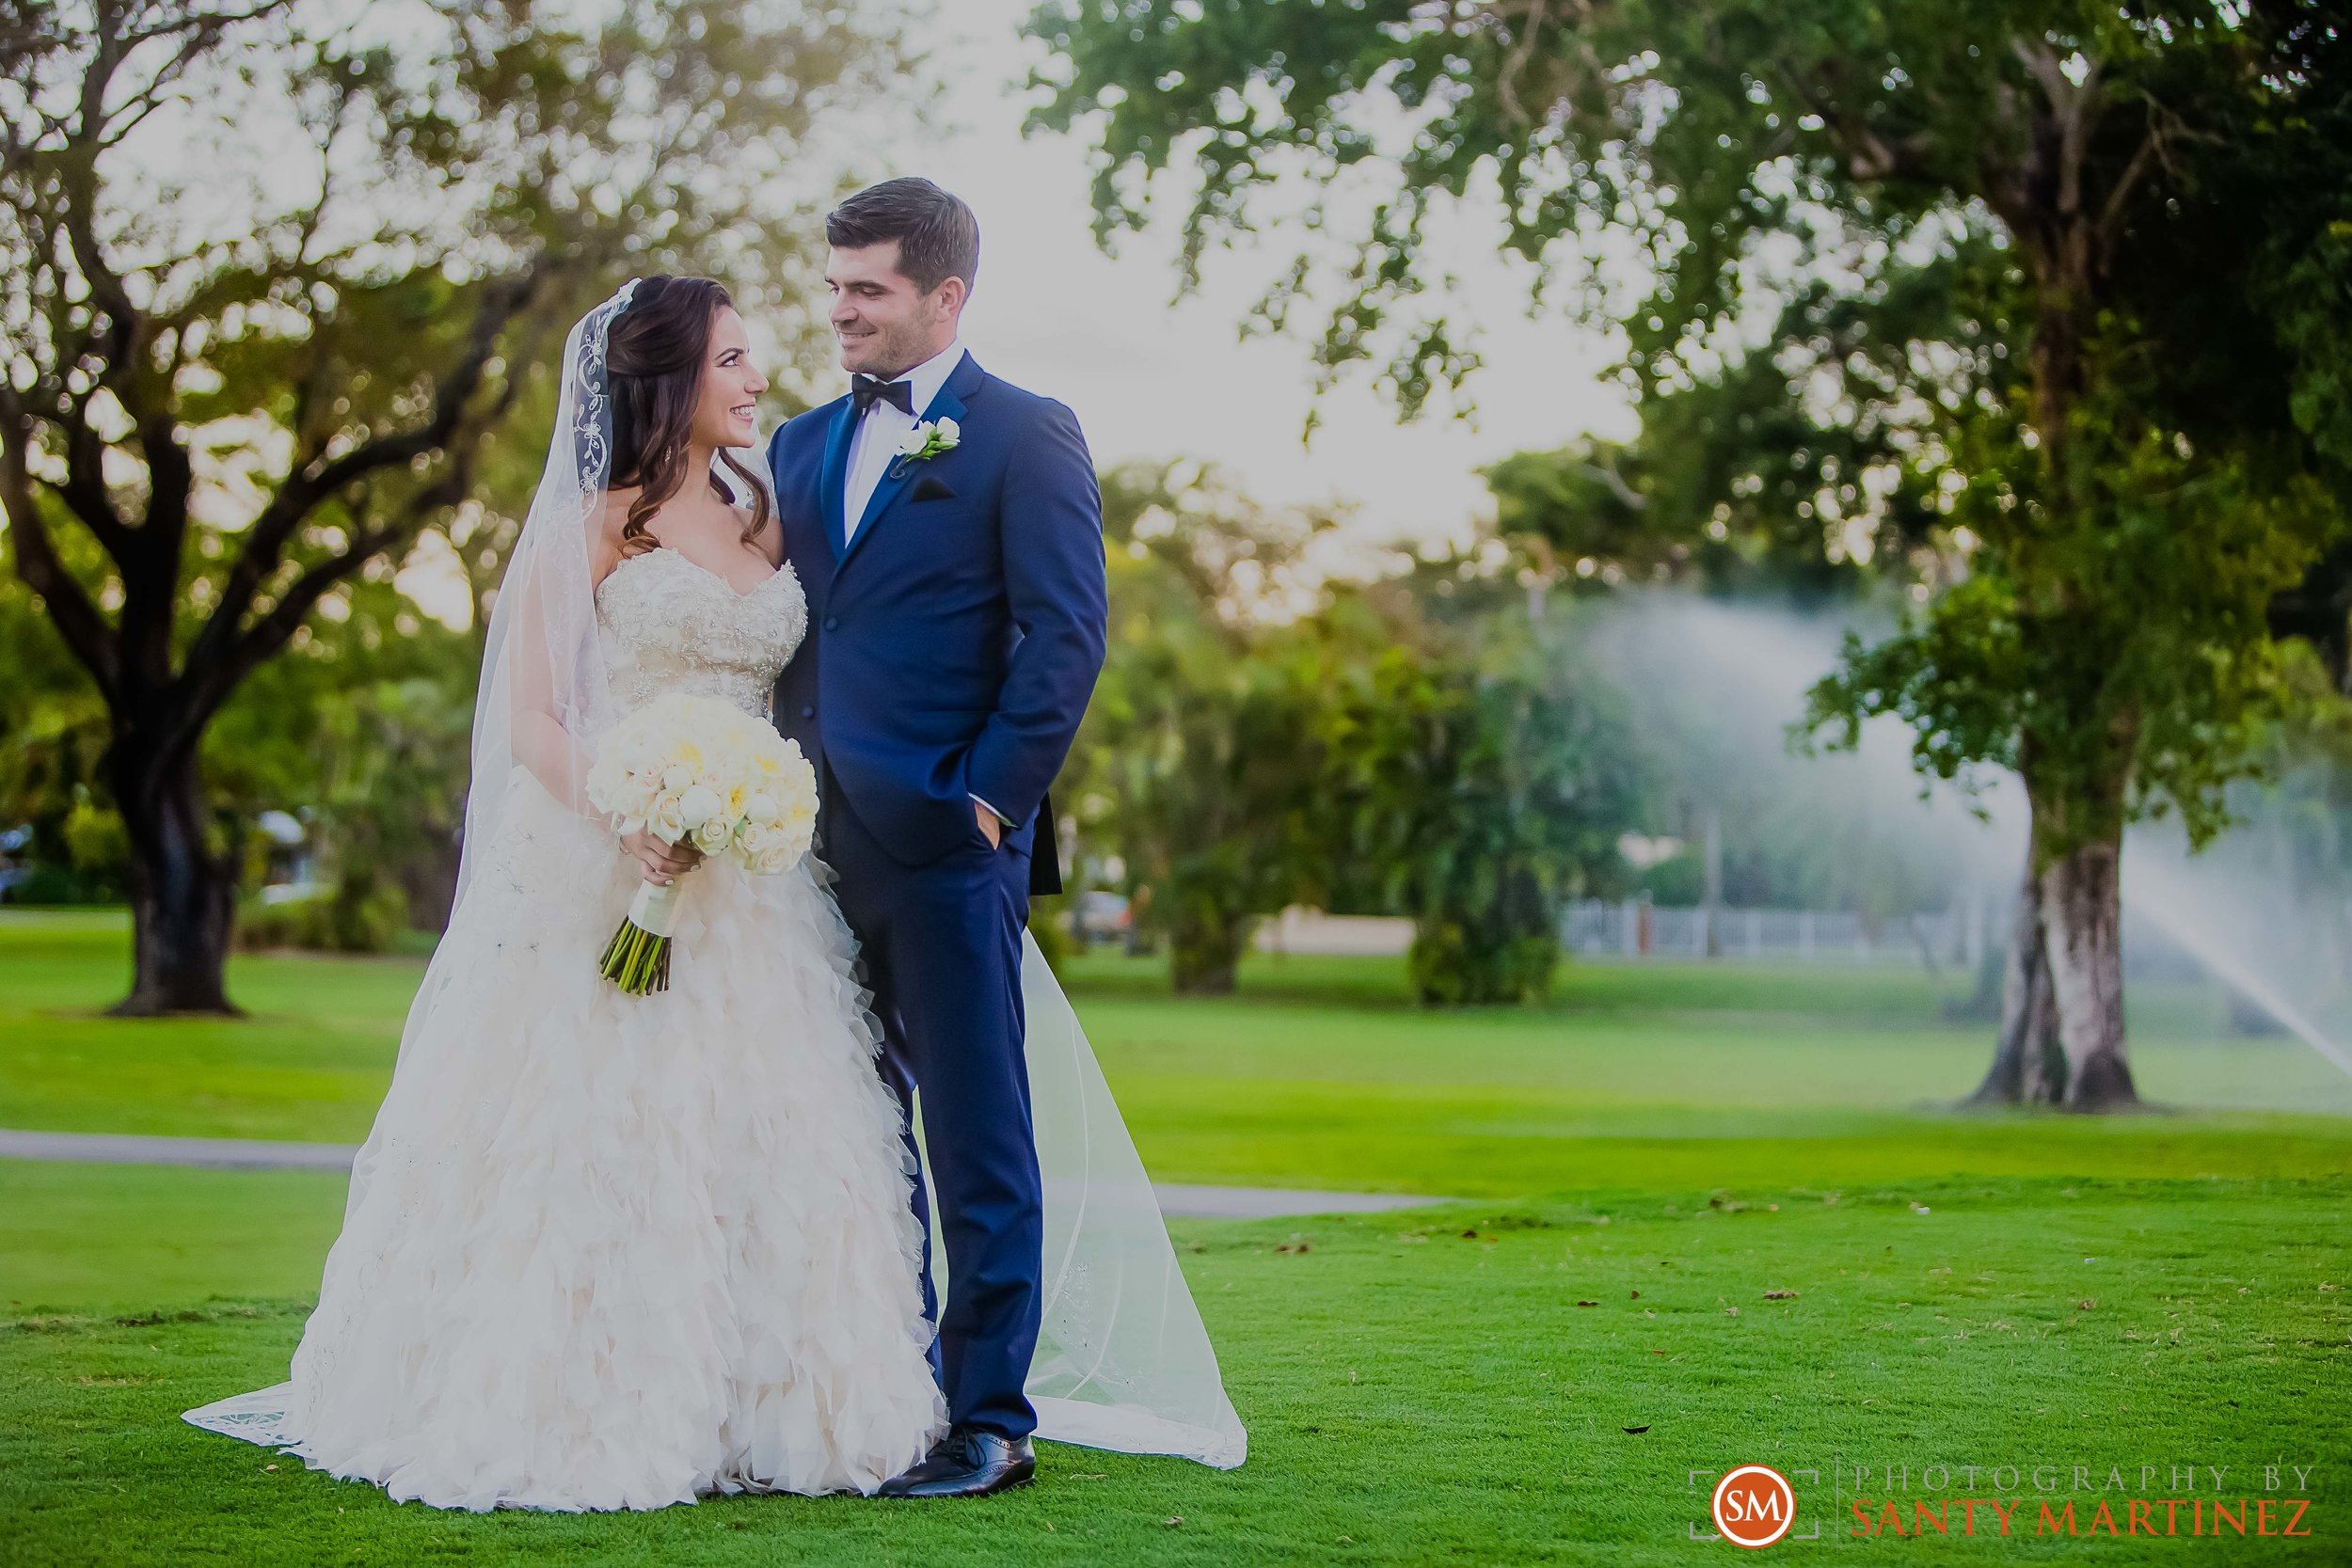 Wedding Coral Gables Country Club - Santy Martinez Photography-20.jpg